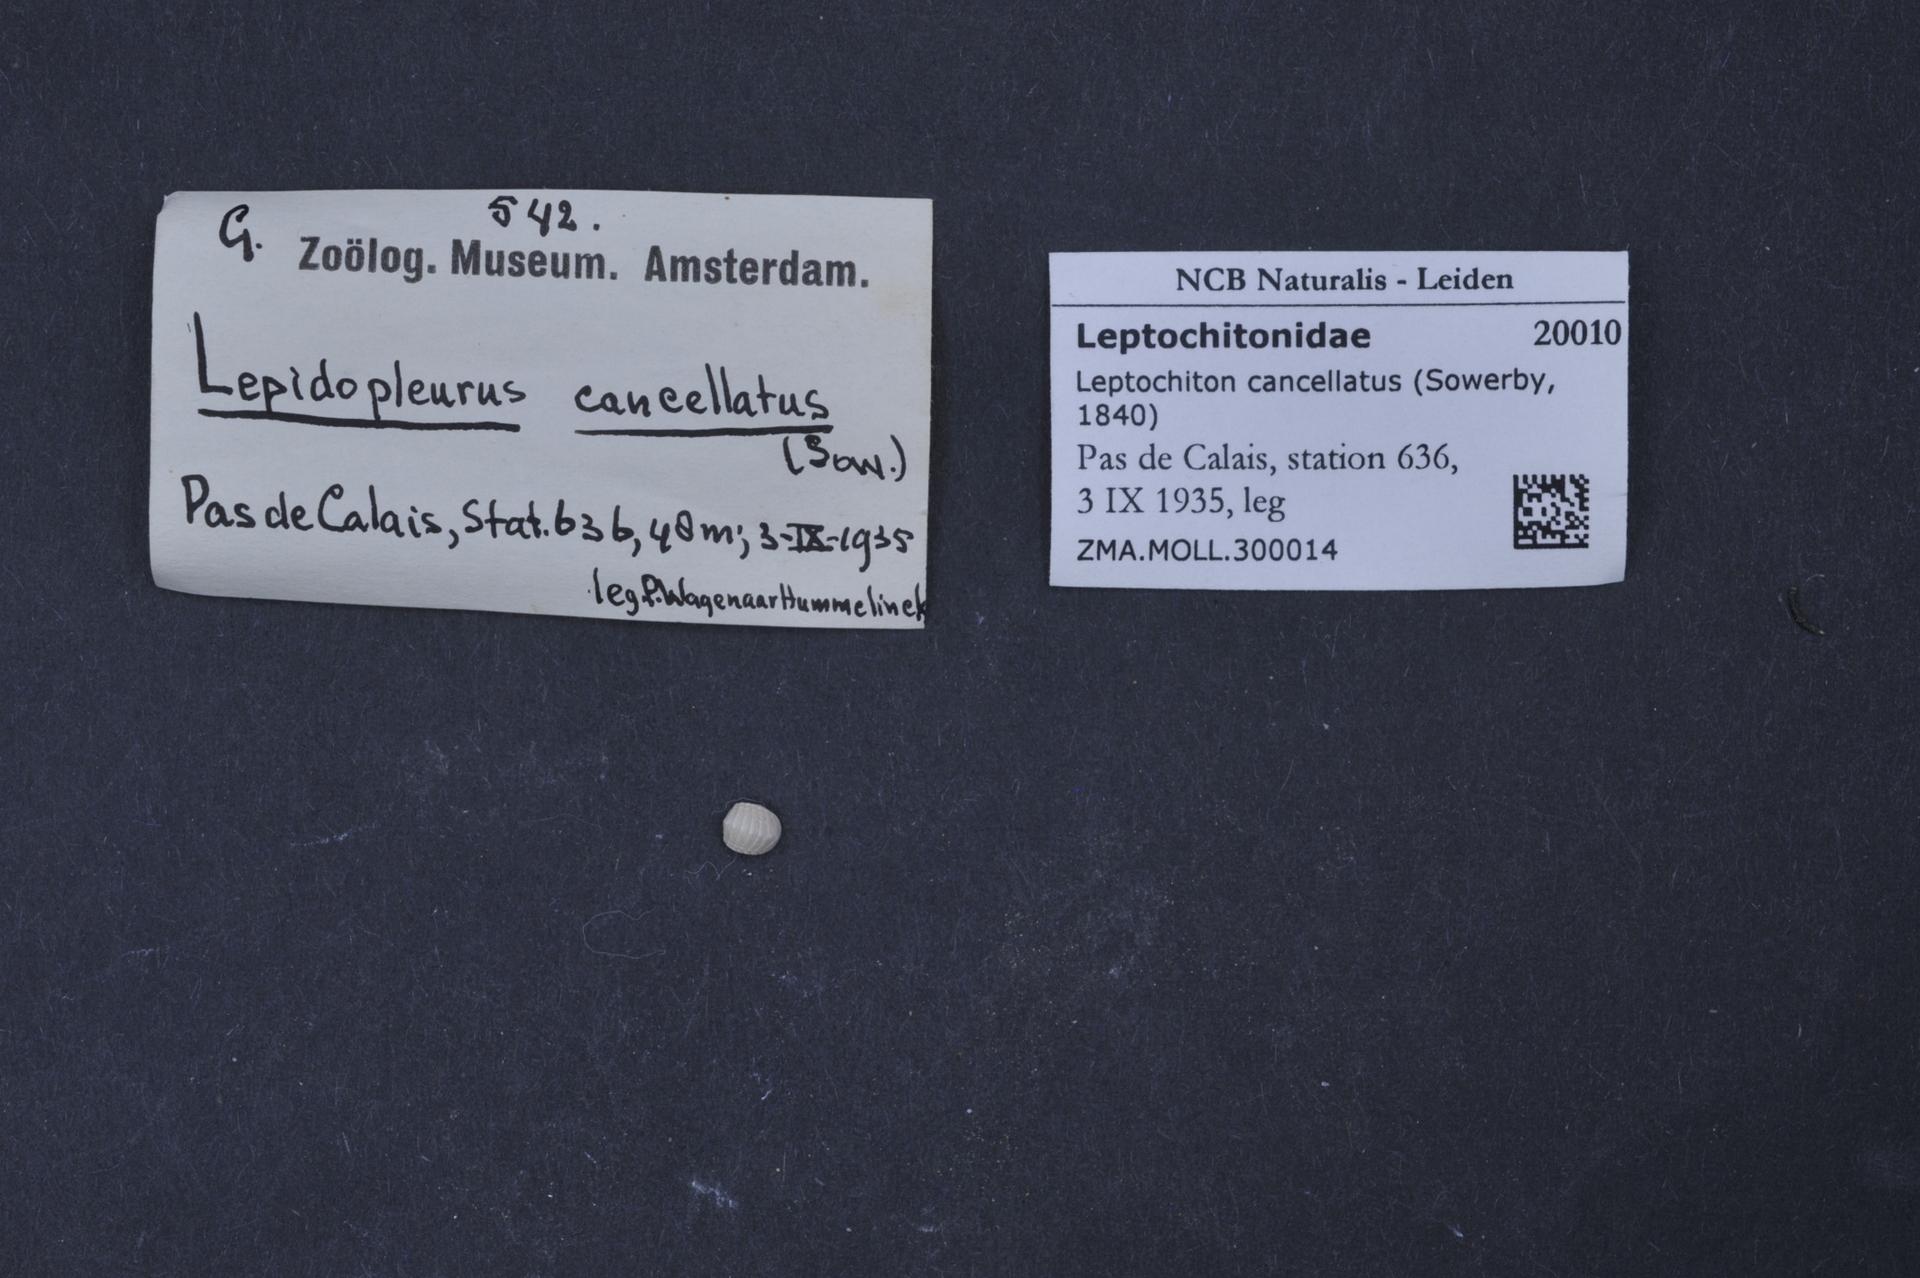 ZMA.MOLL.300014 | Leptochiton cancellatus Sowerby, 1840